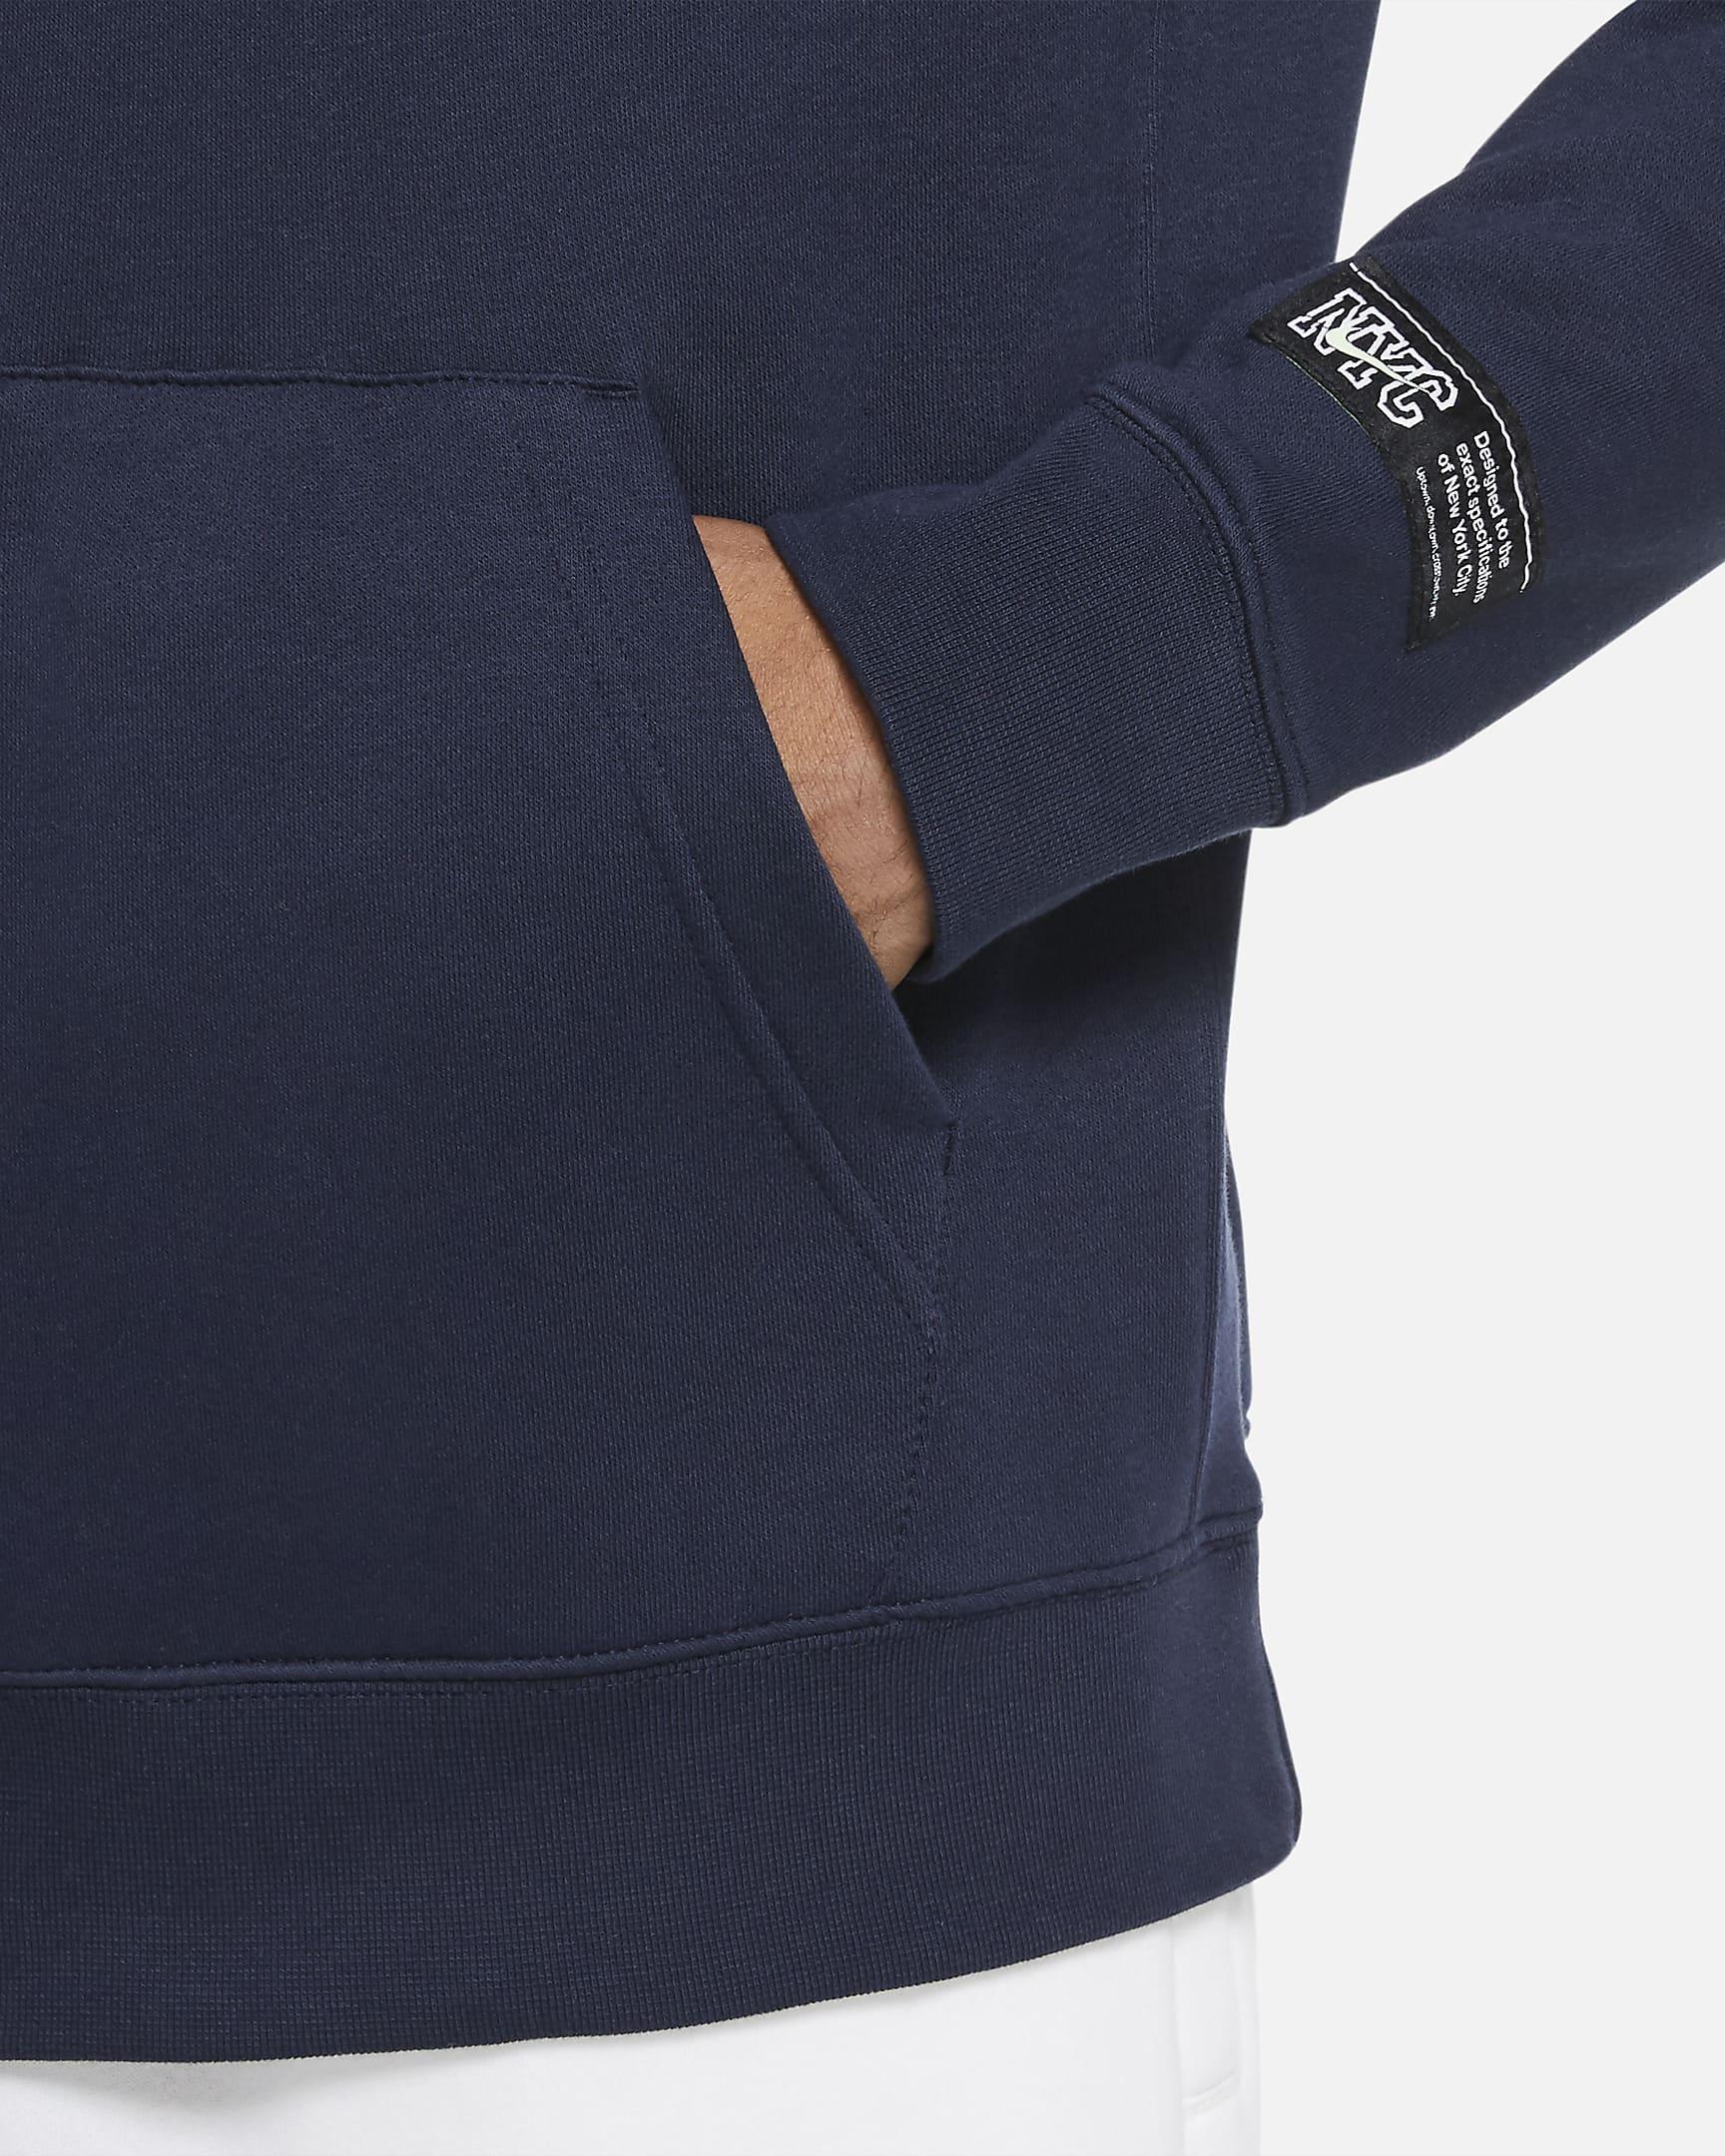 sportswear-club-fleece-mens-pullover-hoodie-s4dtrC-4